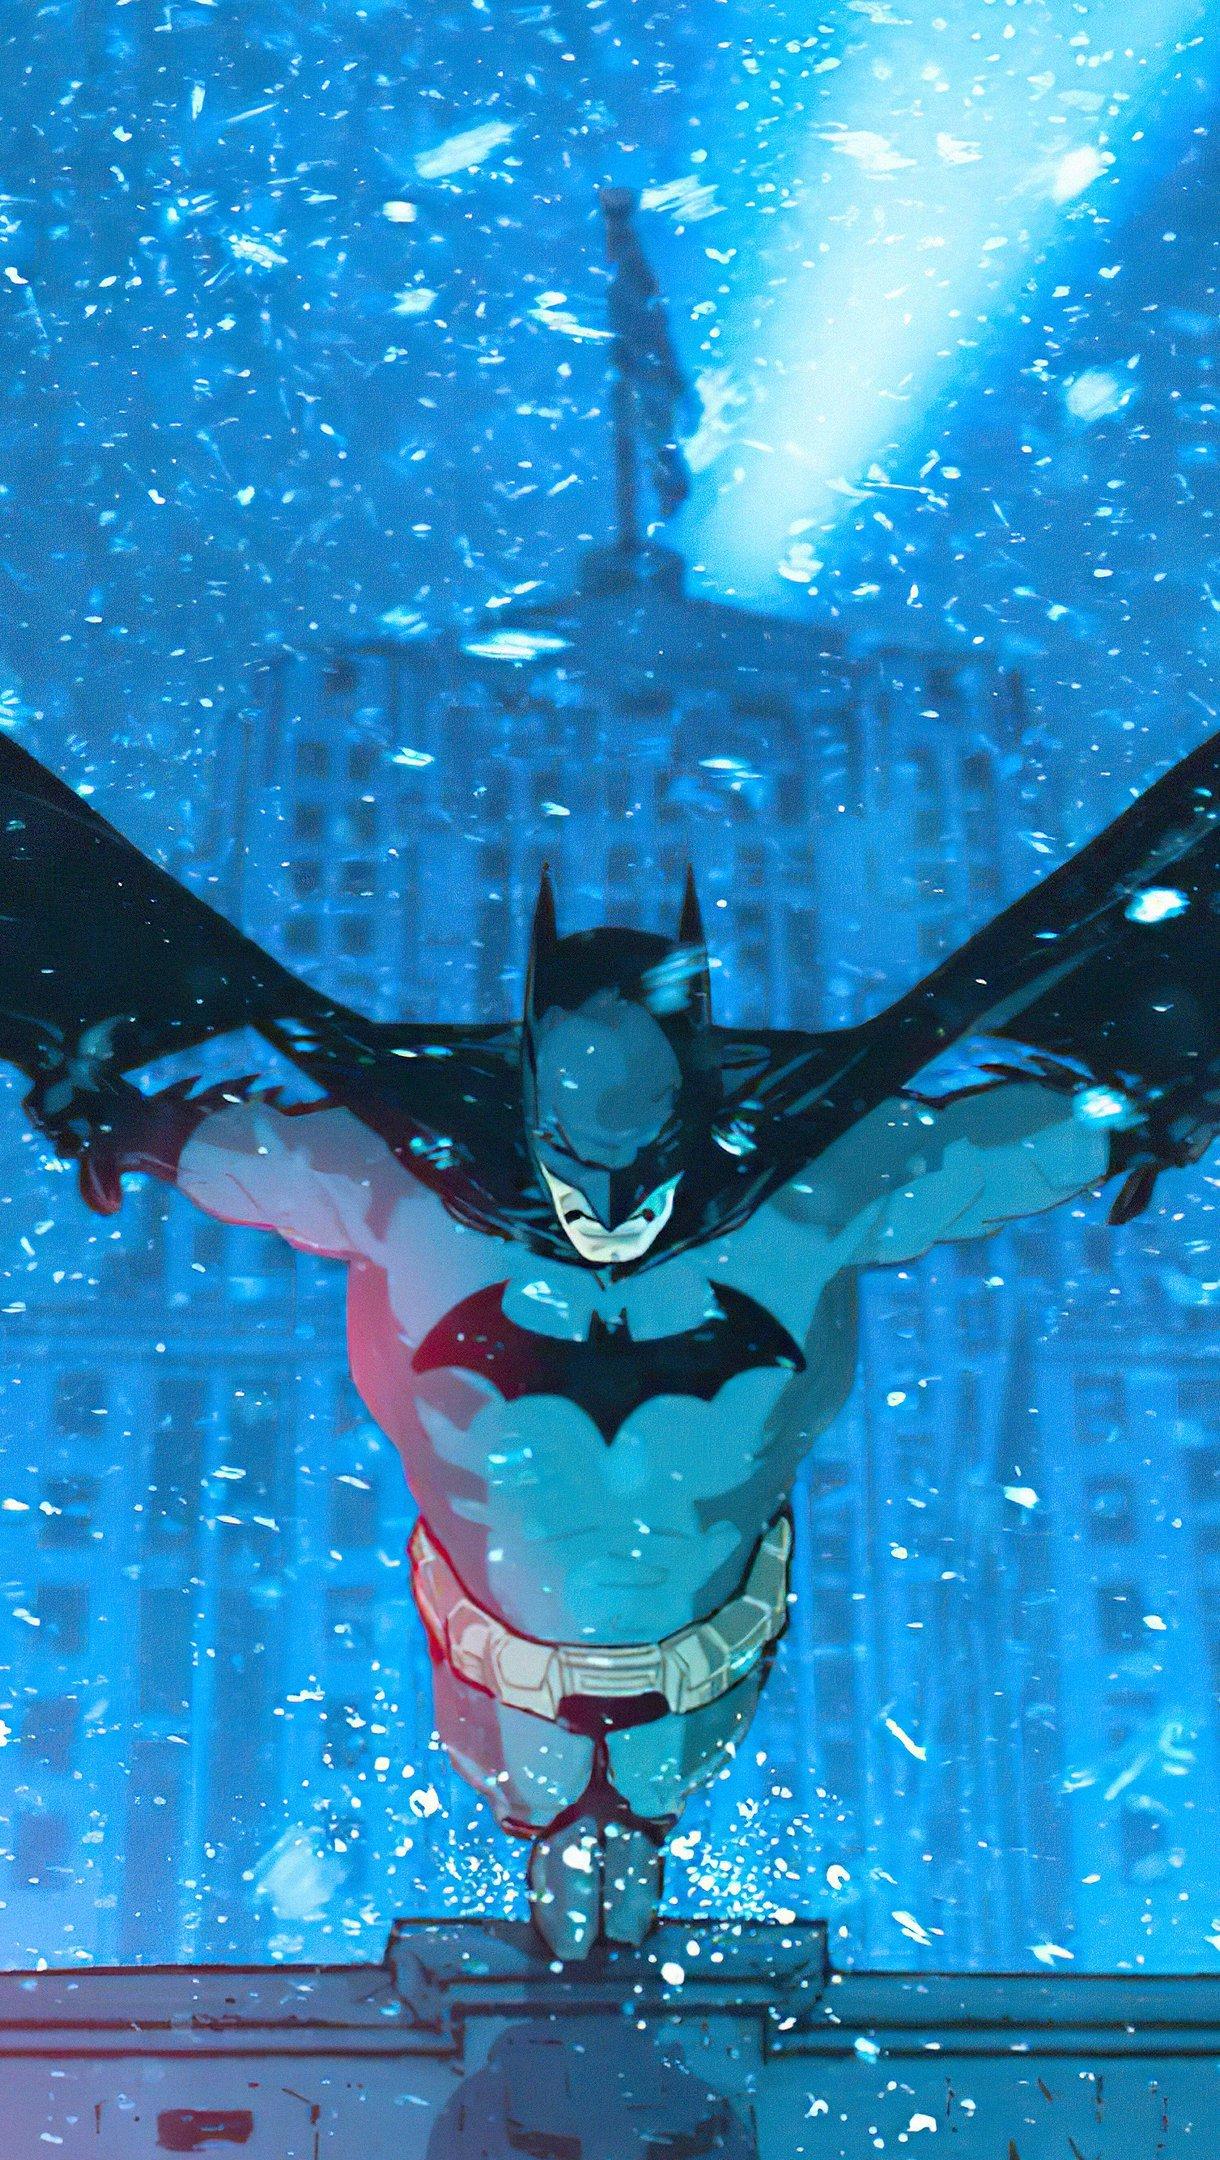 Wallpaper Batman in the city Vertical